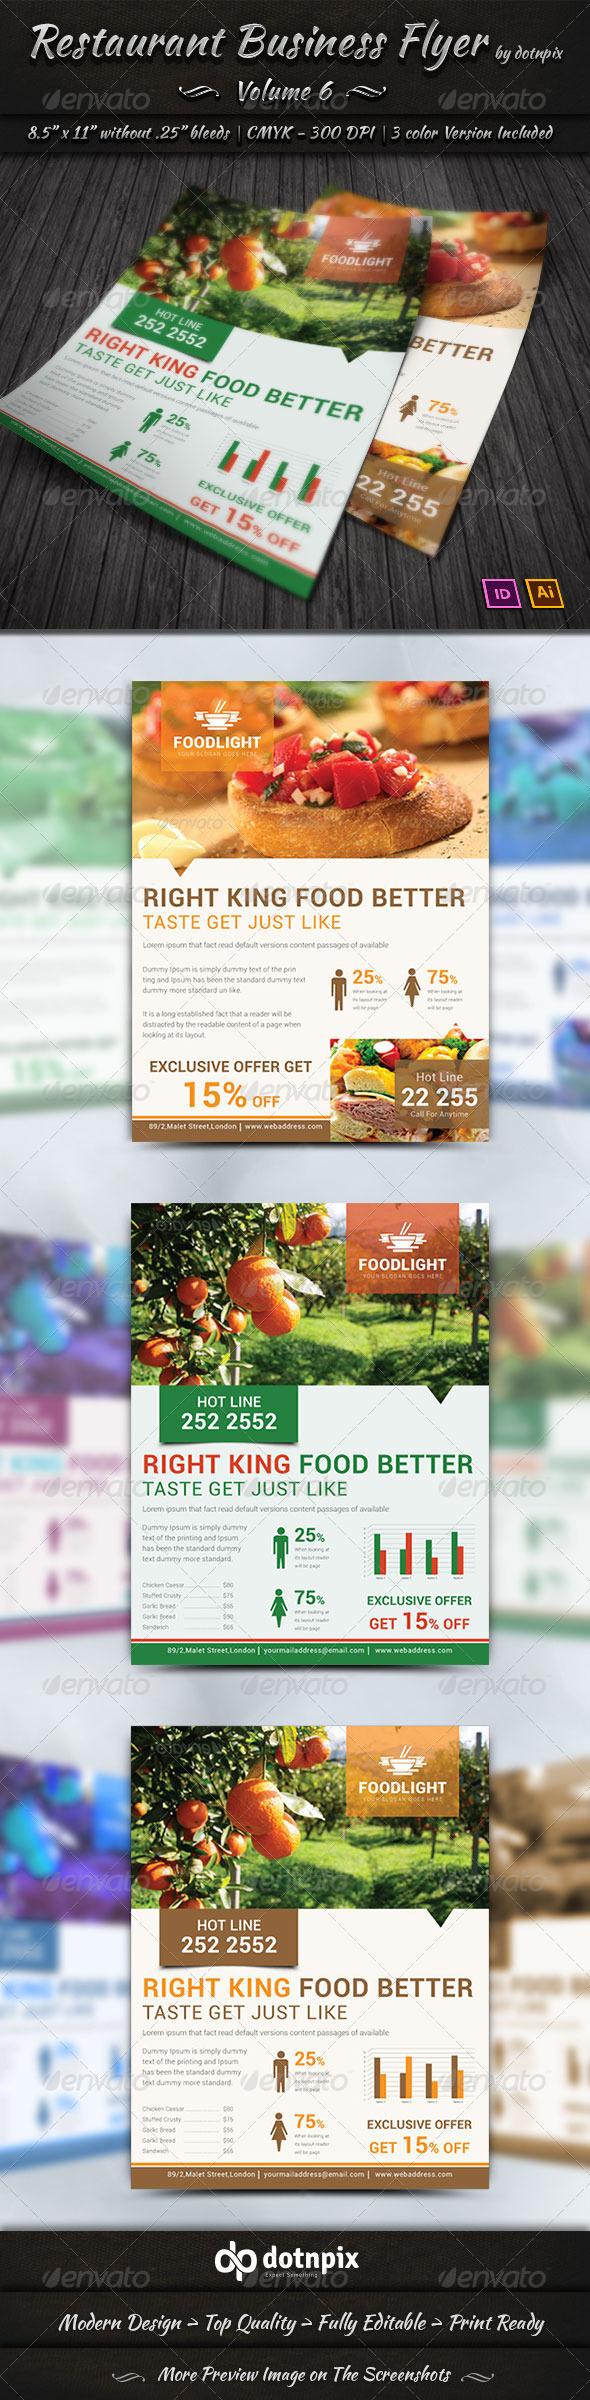 GraphicRiver Restaurant Business Flyer Volume 6 7648592